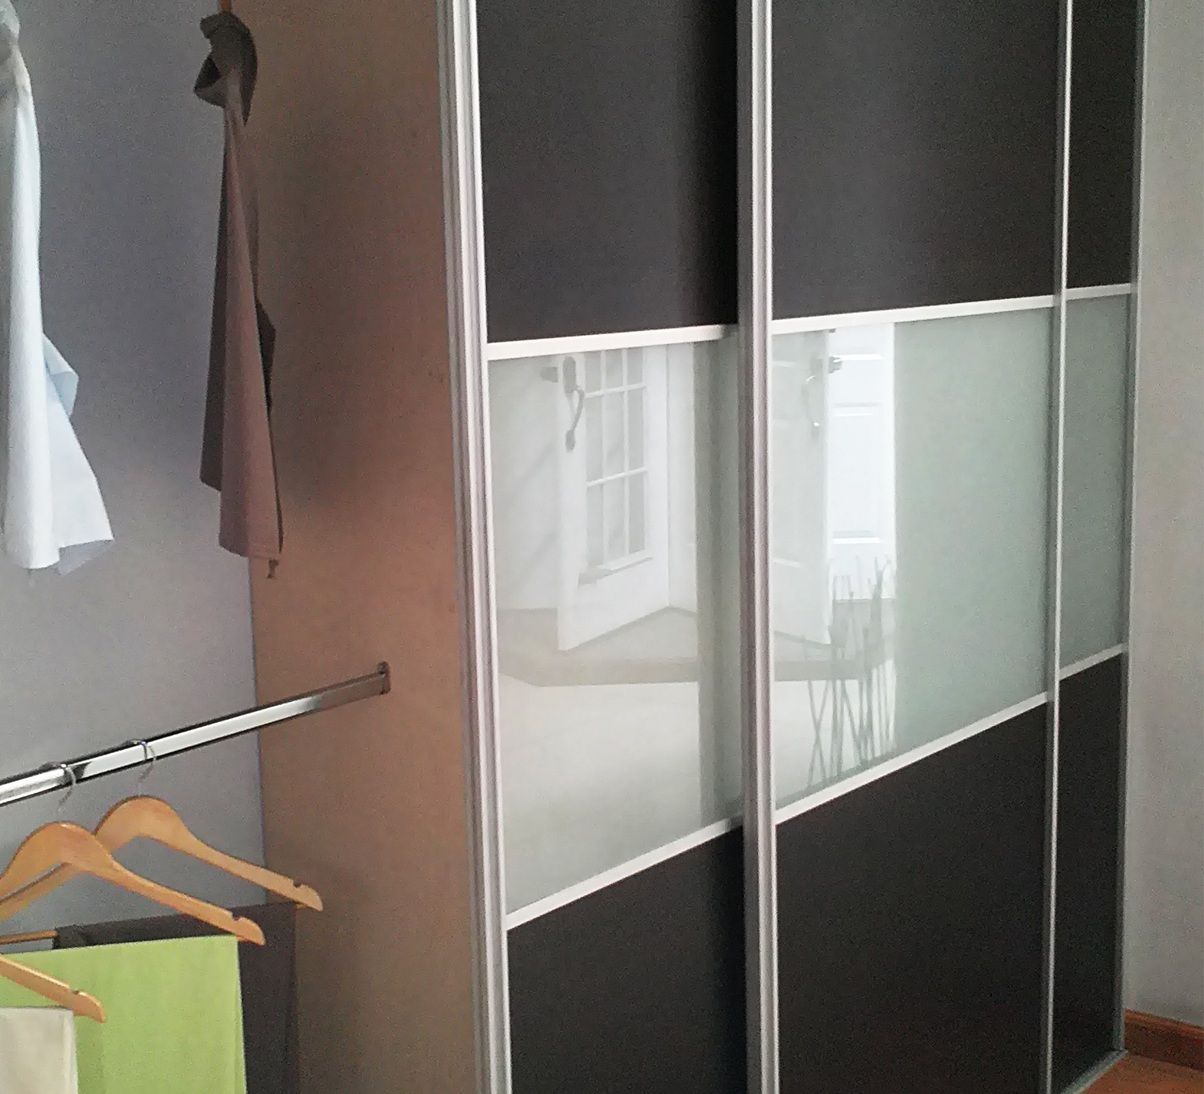 Perfil siena sistema de perfiles de aluminio para puertas de closet puertas pinterest - Perfiles de aluminio para armarios ...